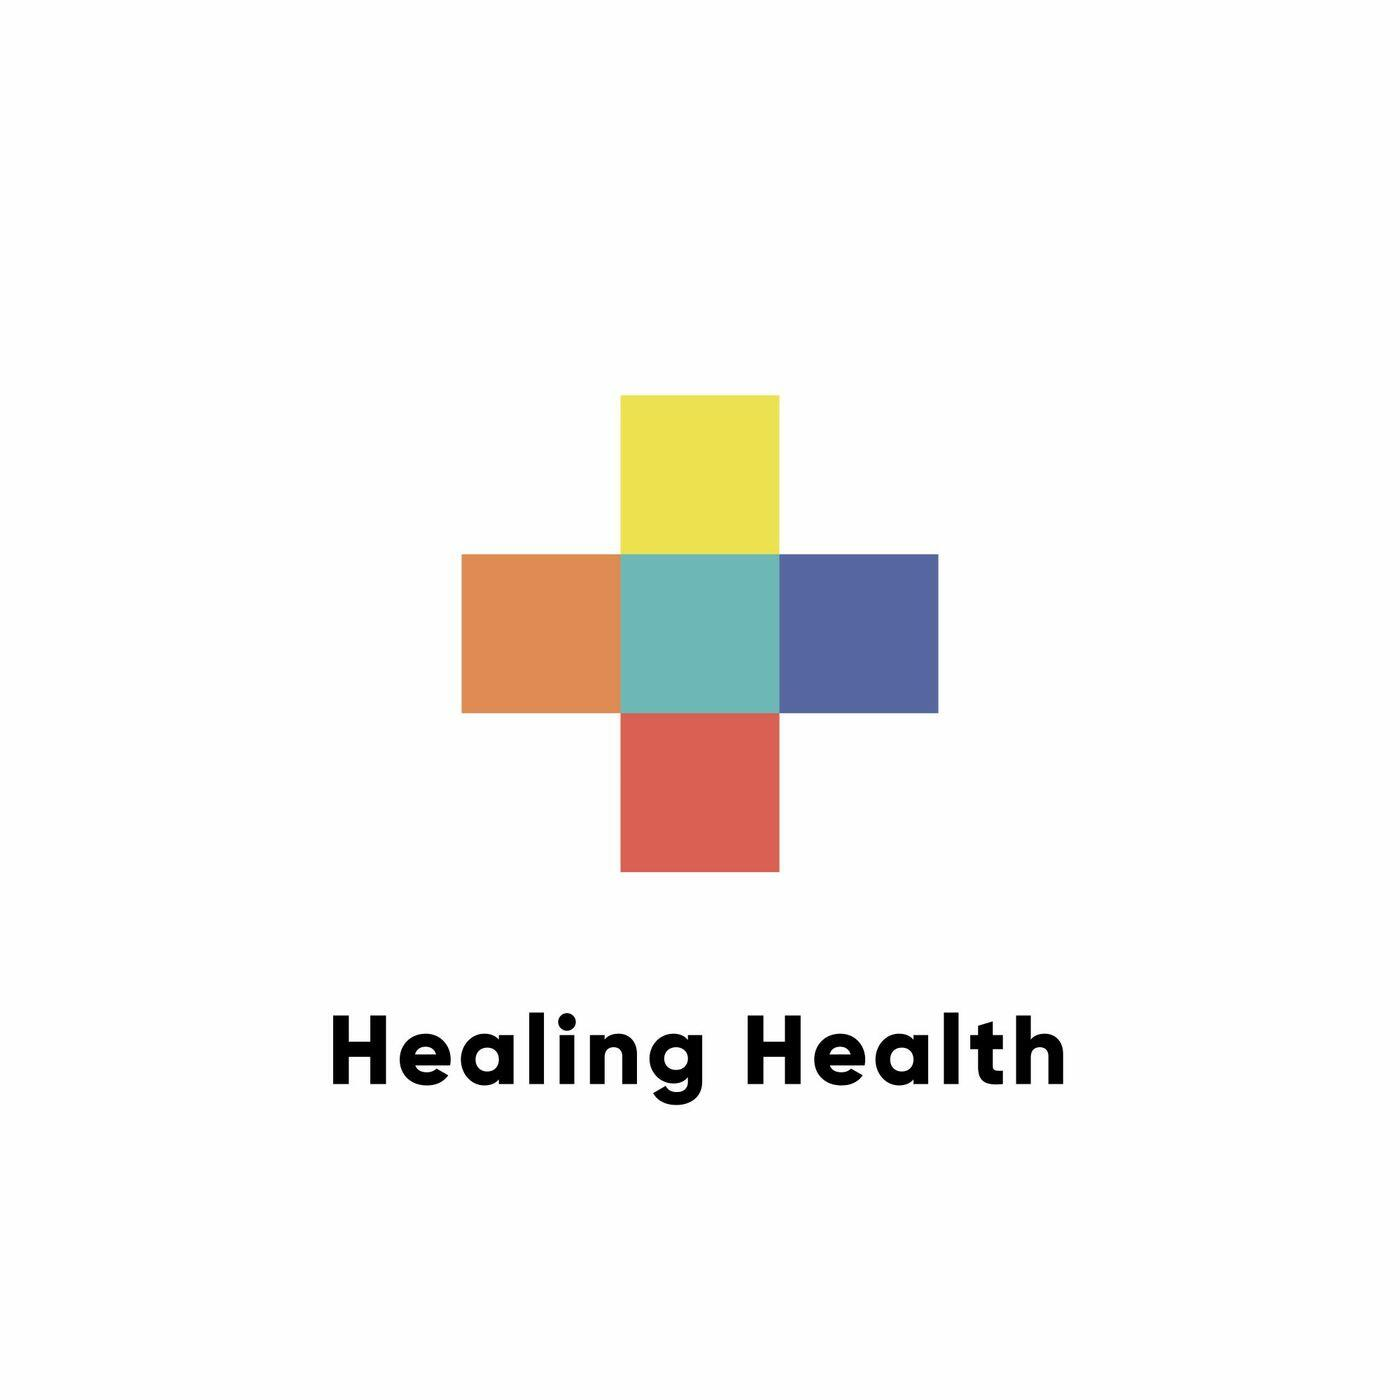 Healing Health